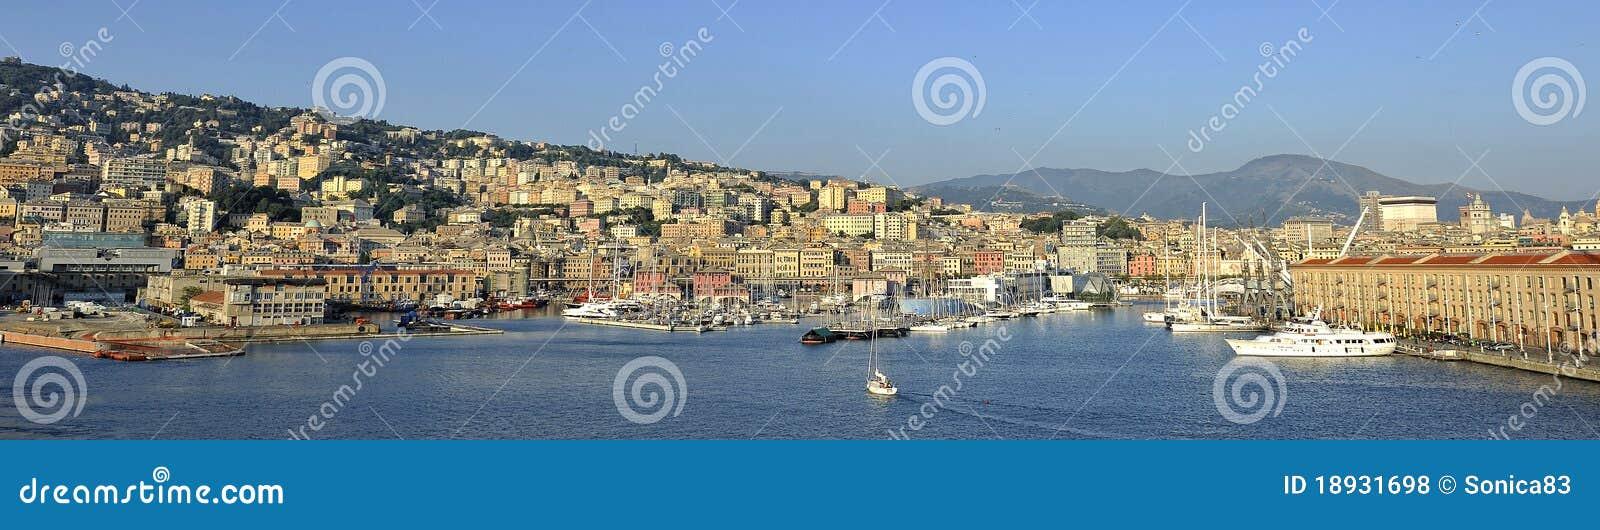 Old port of Genoa, panorama